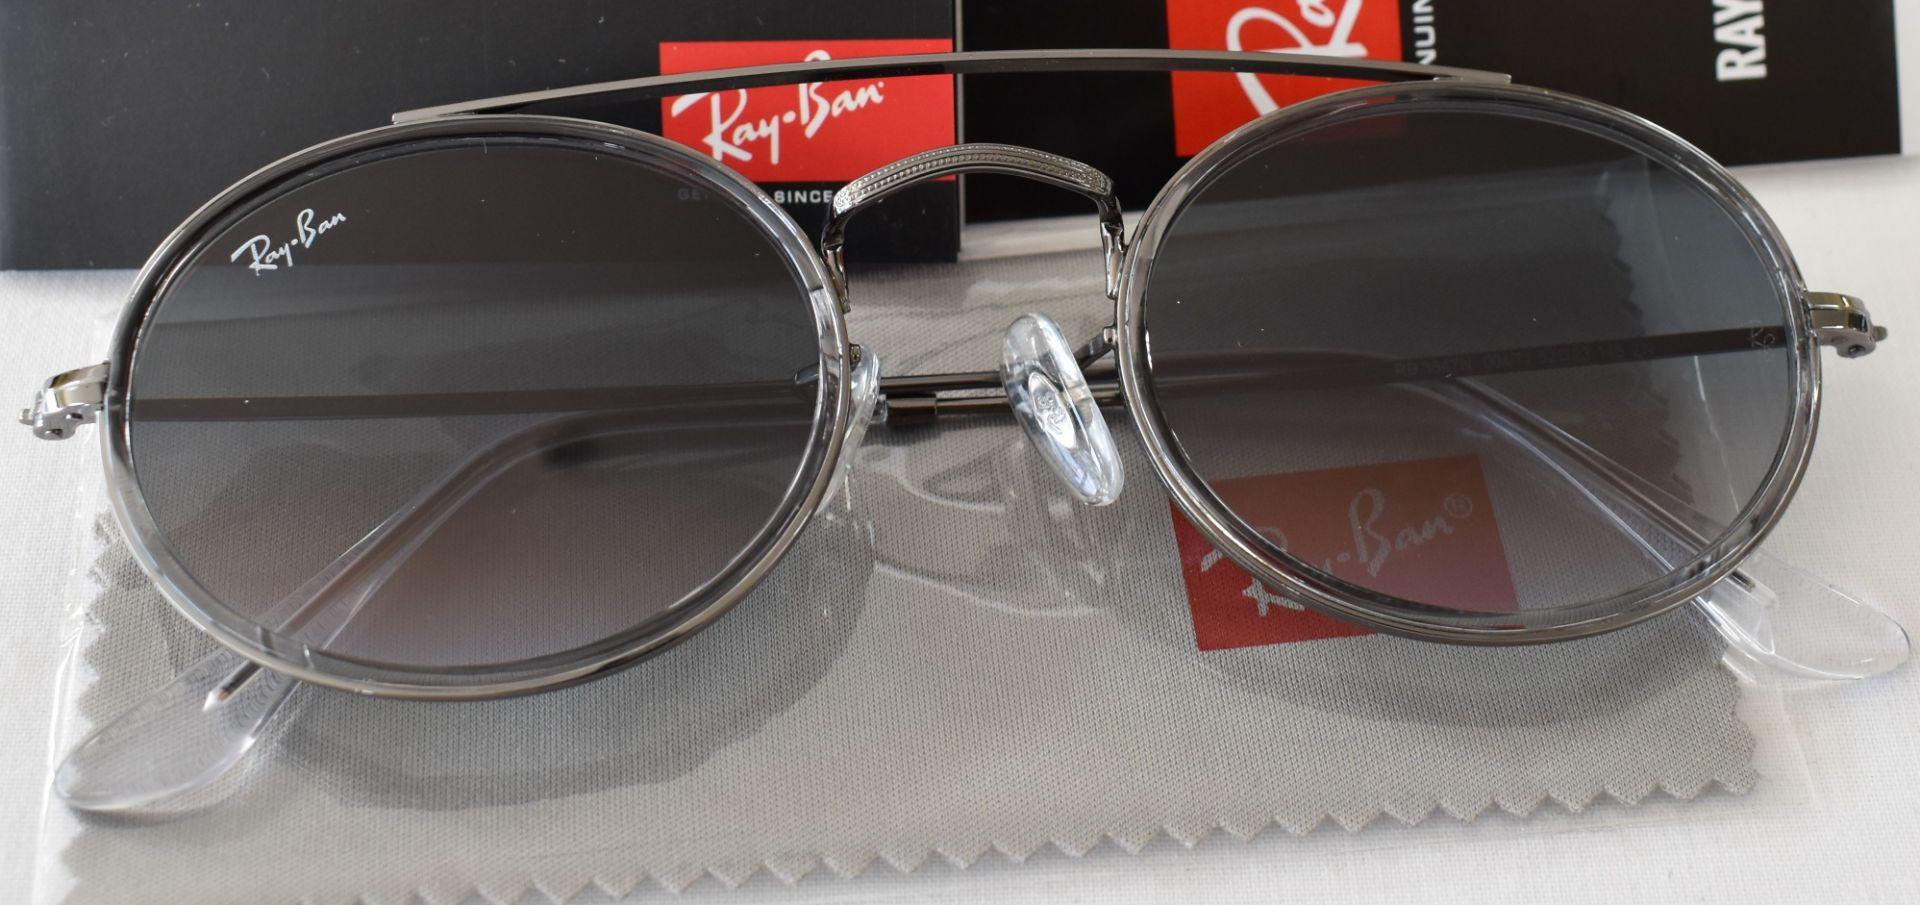 Ray Ban Sunglasses ORB3847N 004/71 *2N - Image 2 of 3